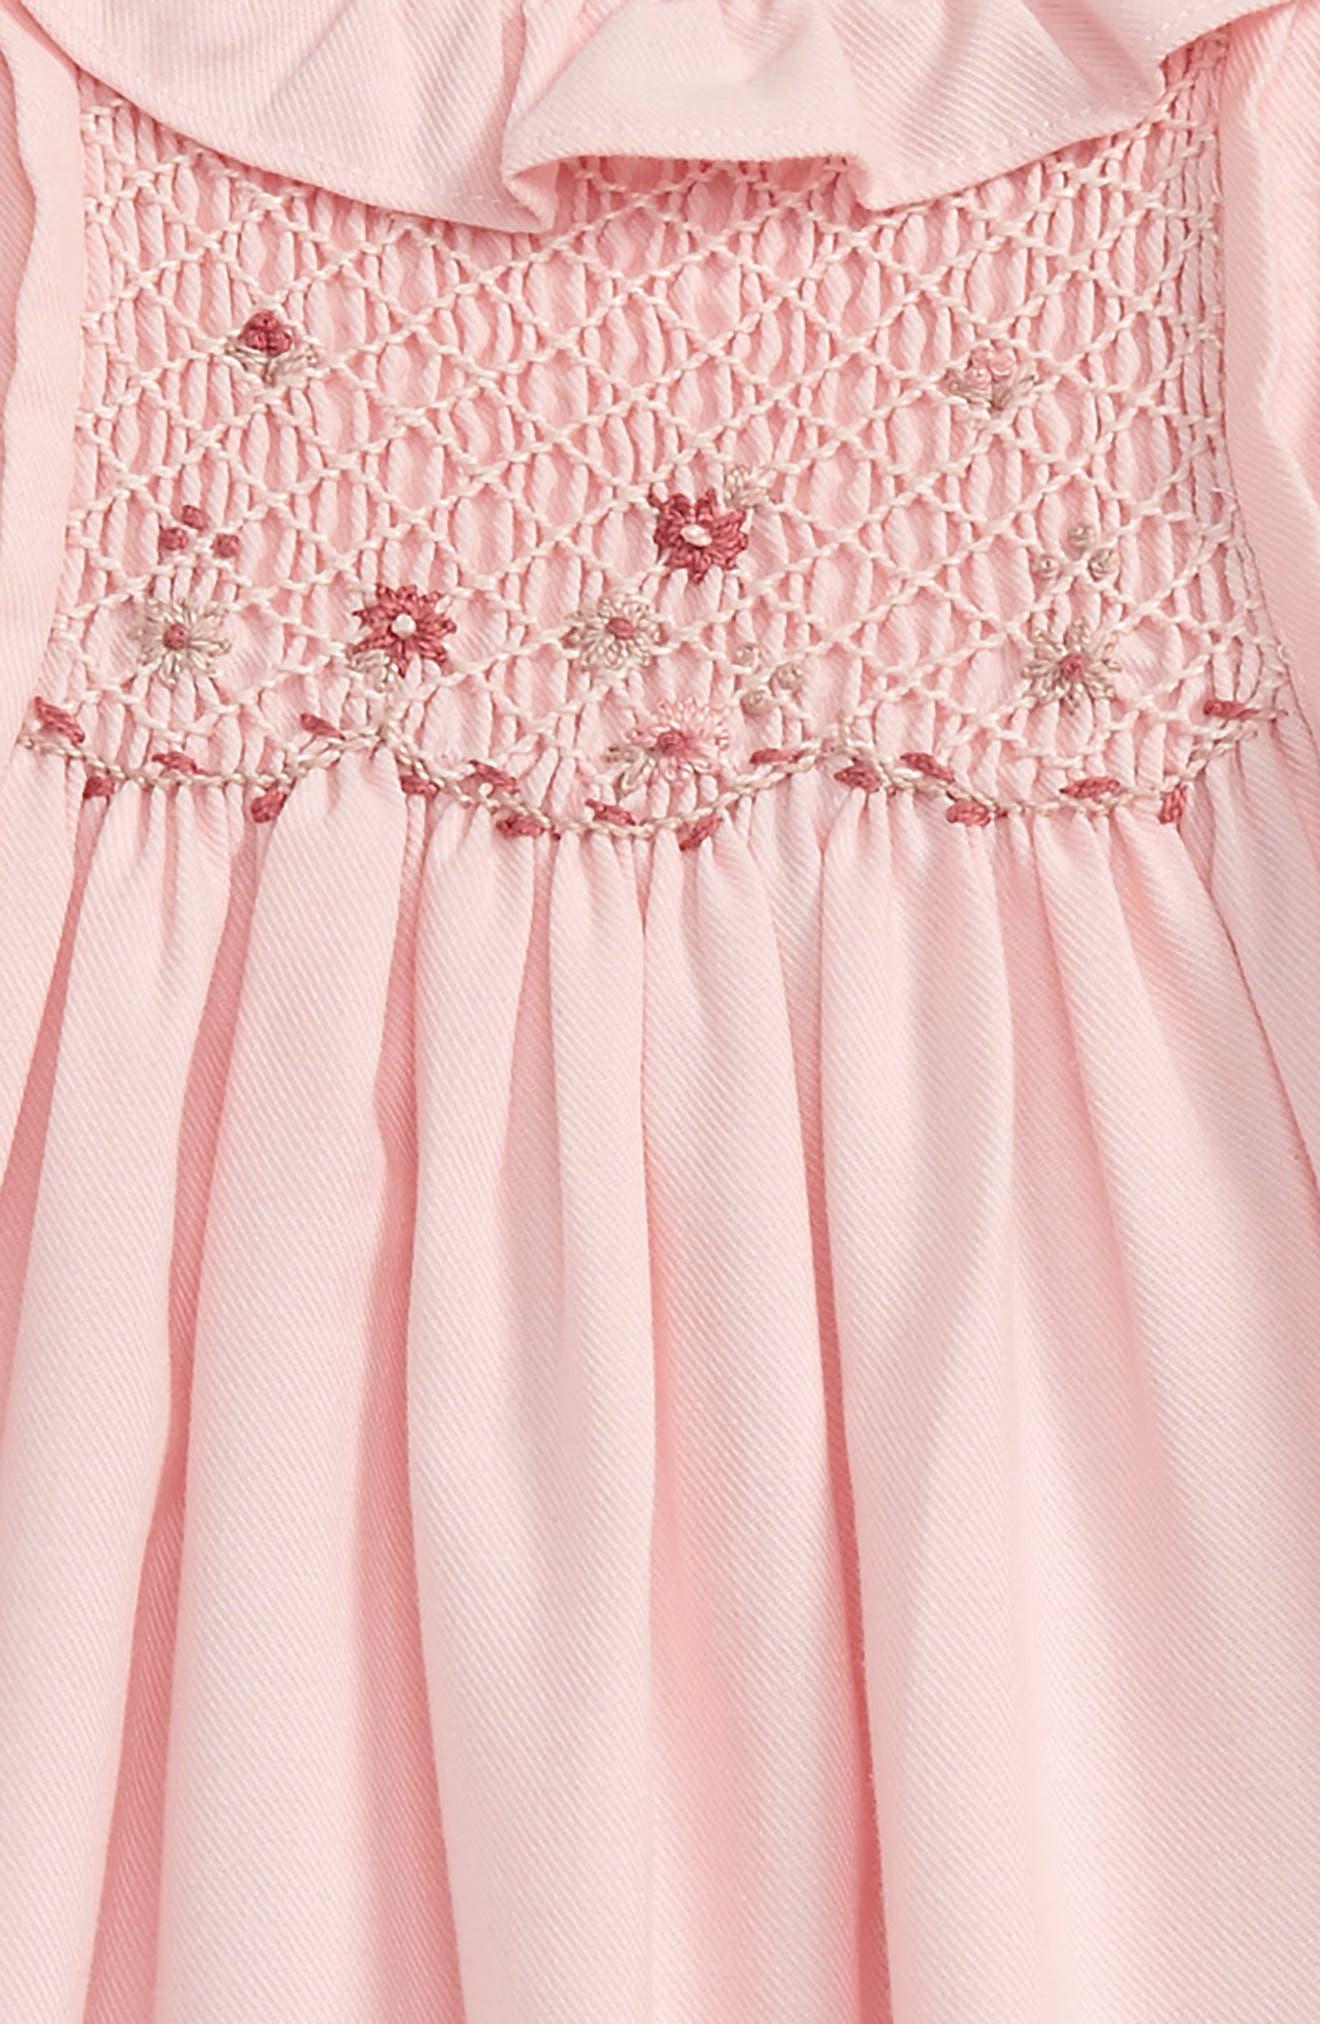 LULI & ME,                             Viyella Smocked Dress,                             Alternate thumbnail 2, color,                             650